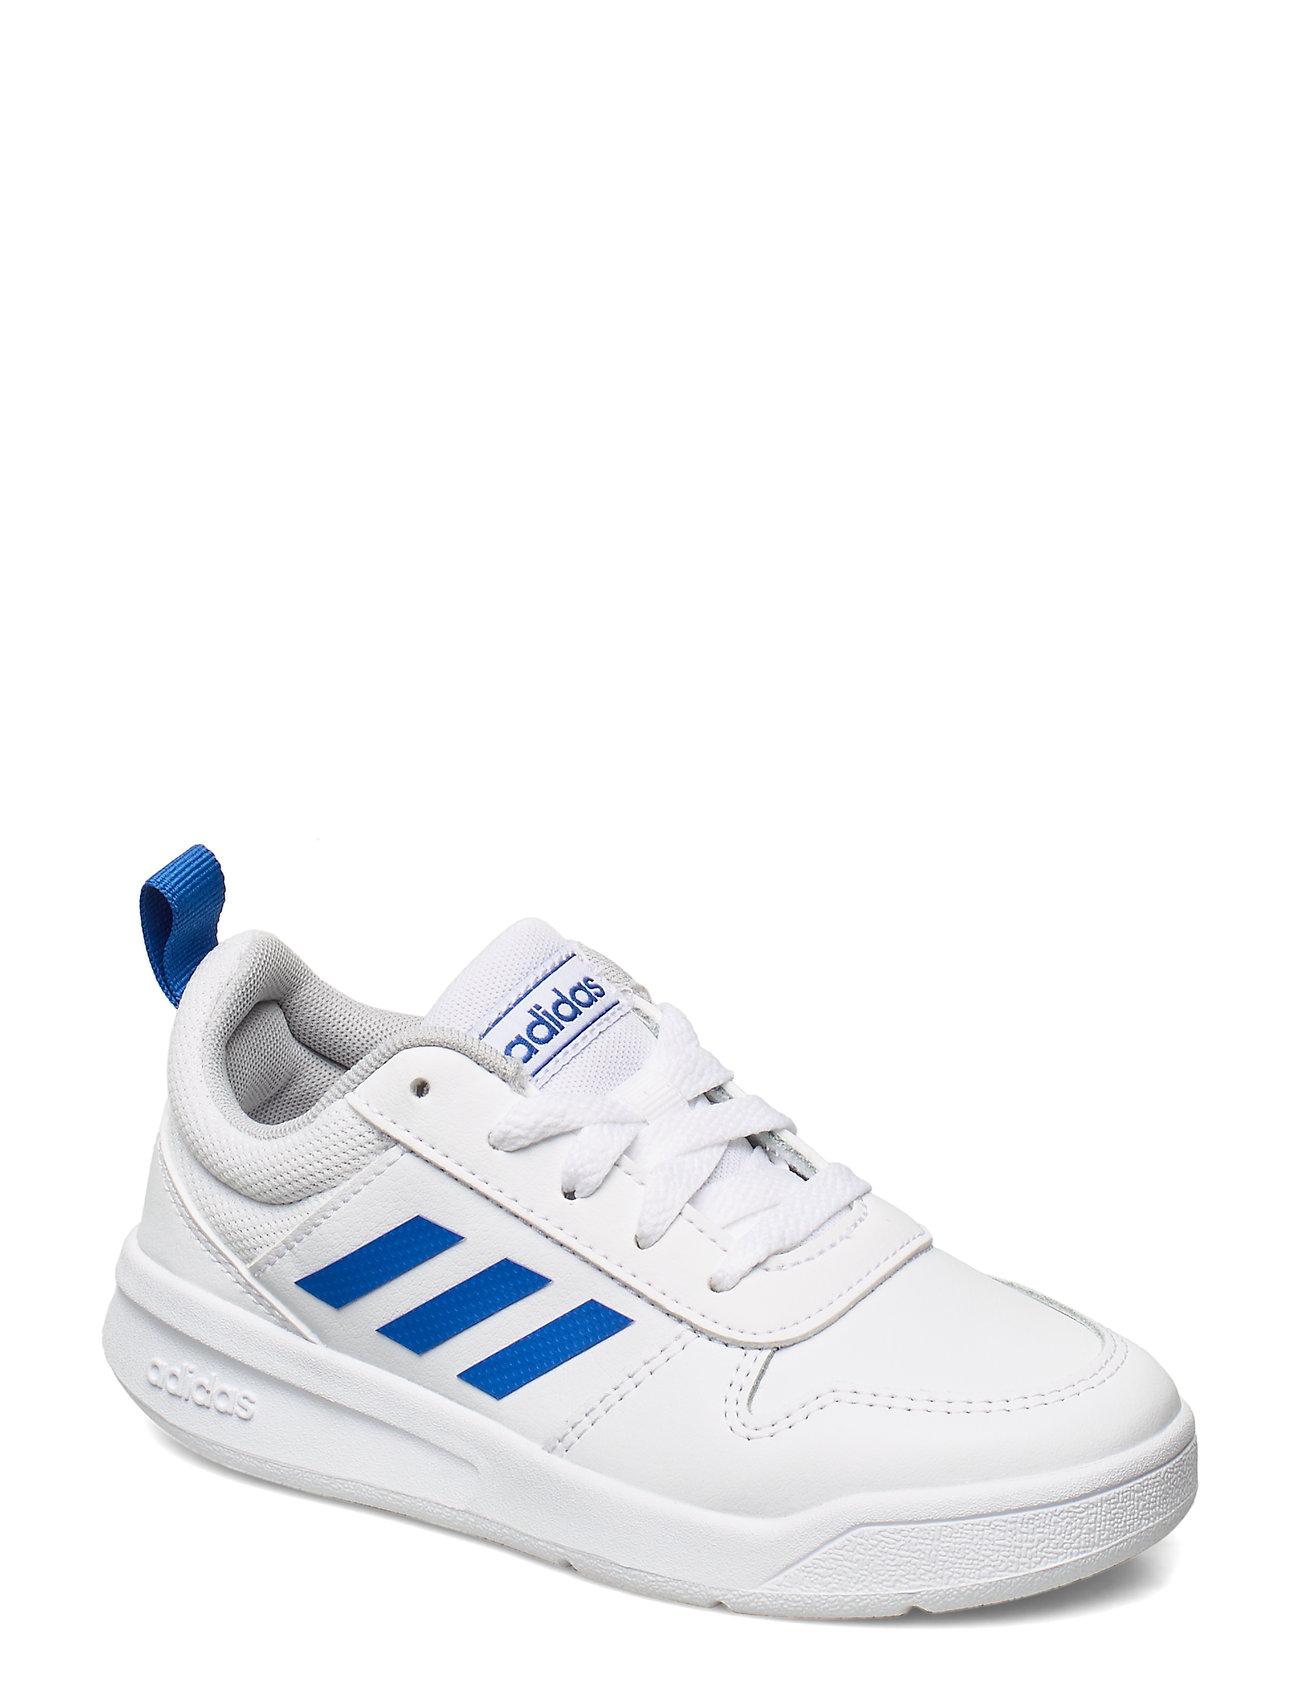 adidas Performance TENSAUR K - FTWWHT/BLUE/FTWWHT